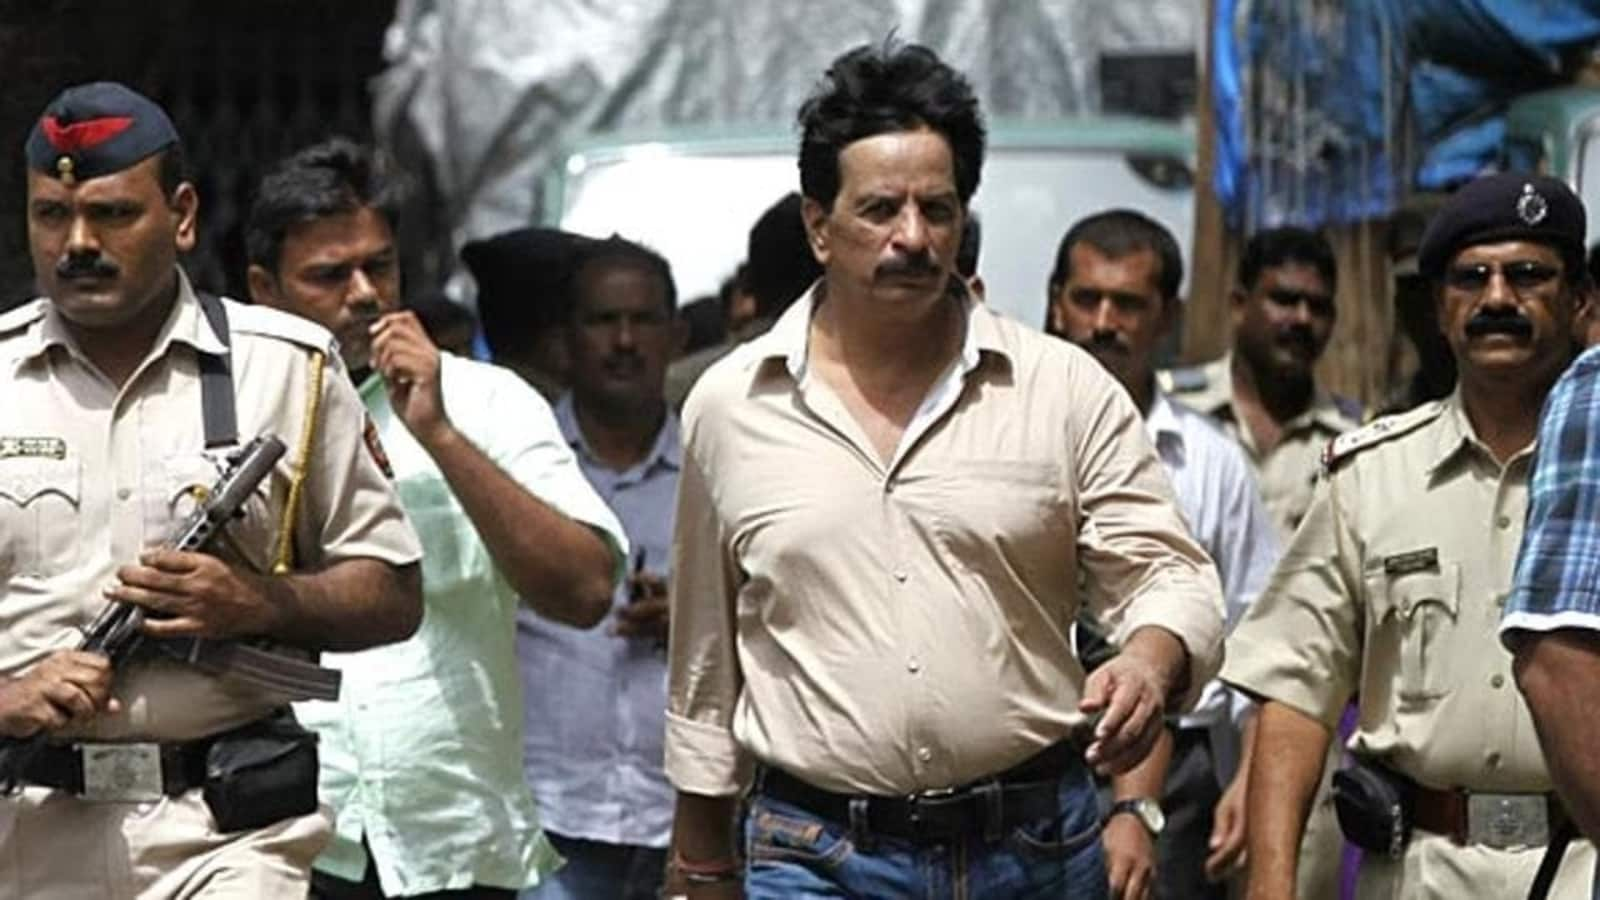 Pradeep Sharma: Encounter specialist's brush with controversies   Mumbai  news - Hindustan Times